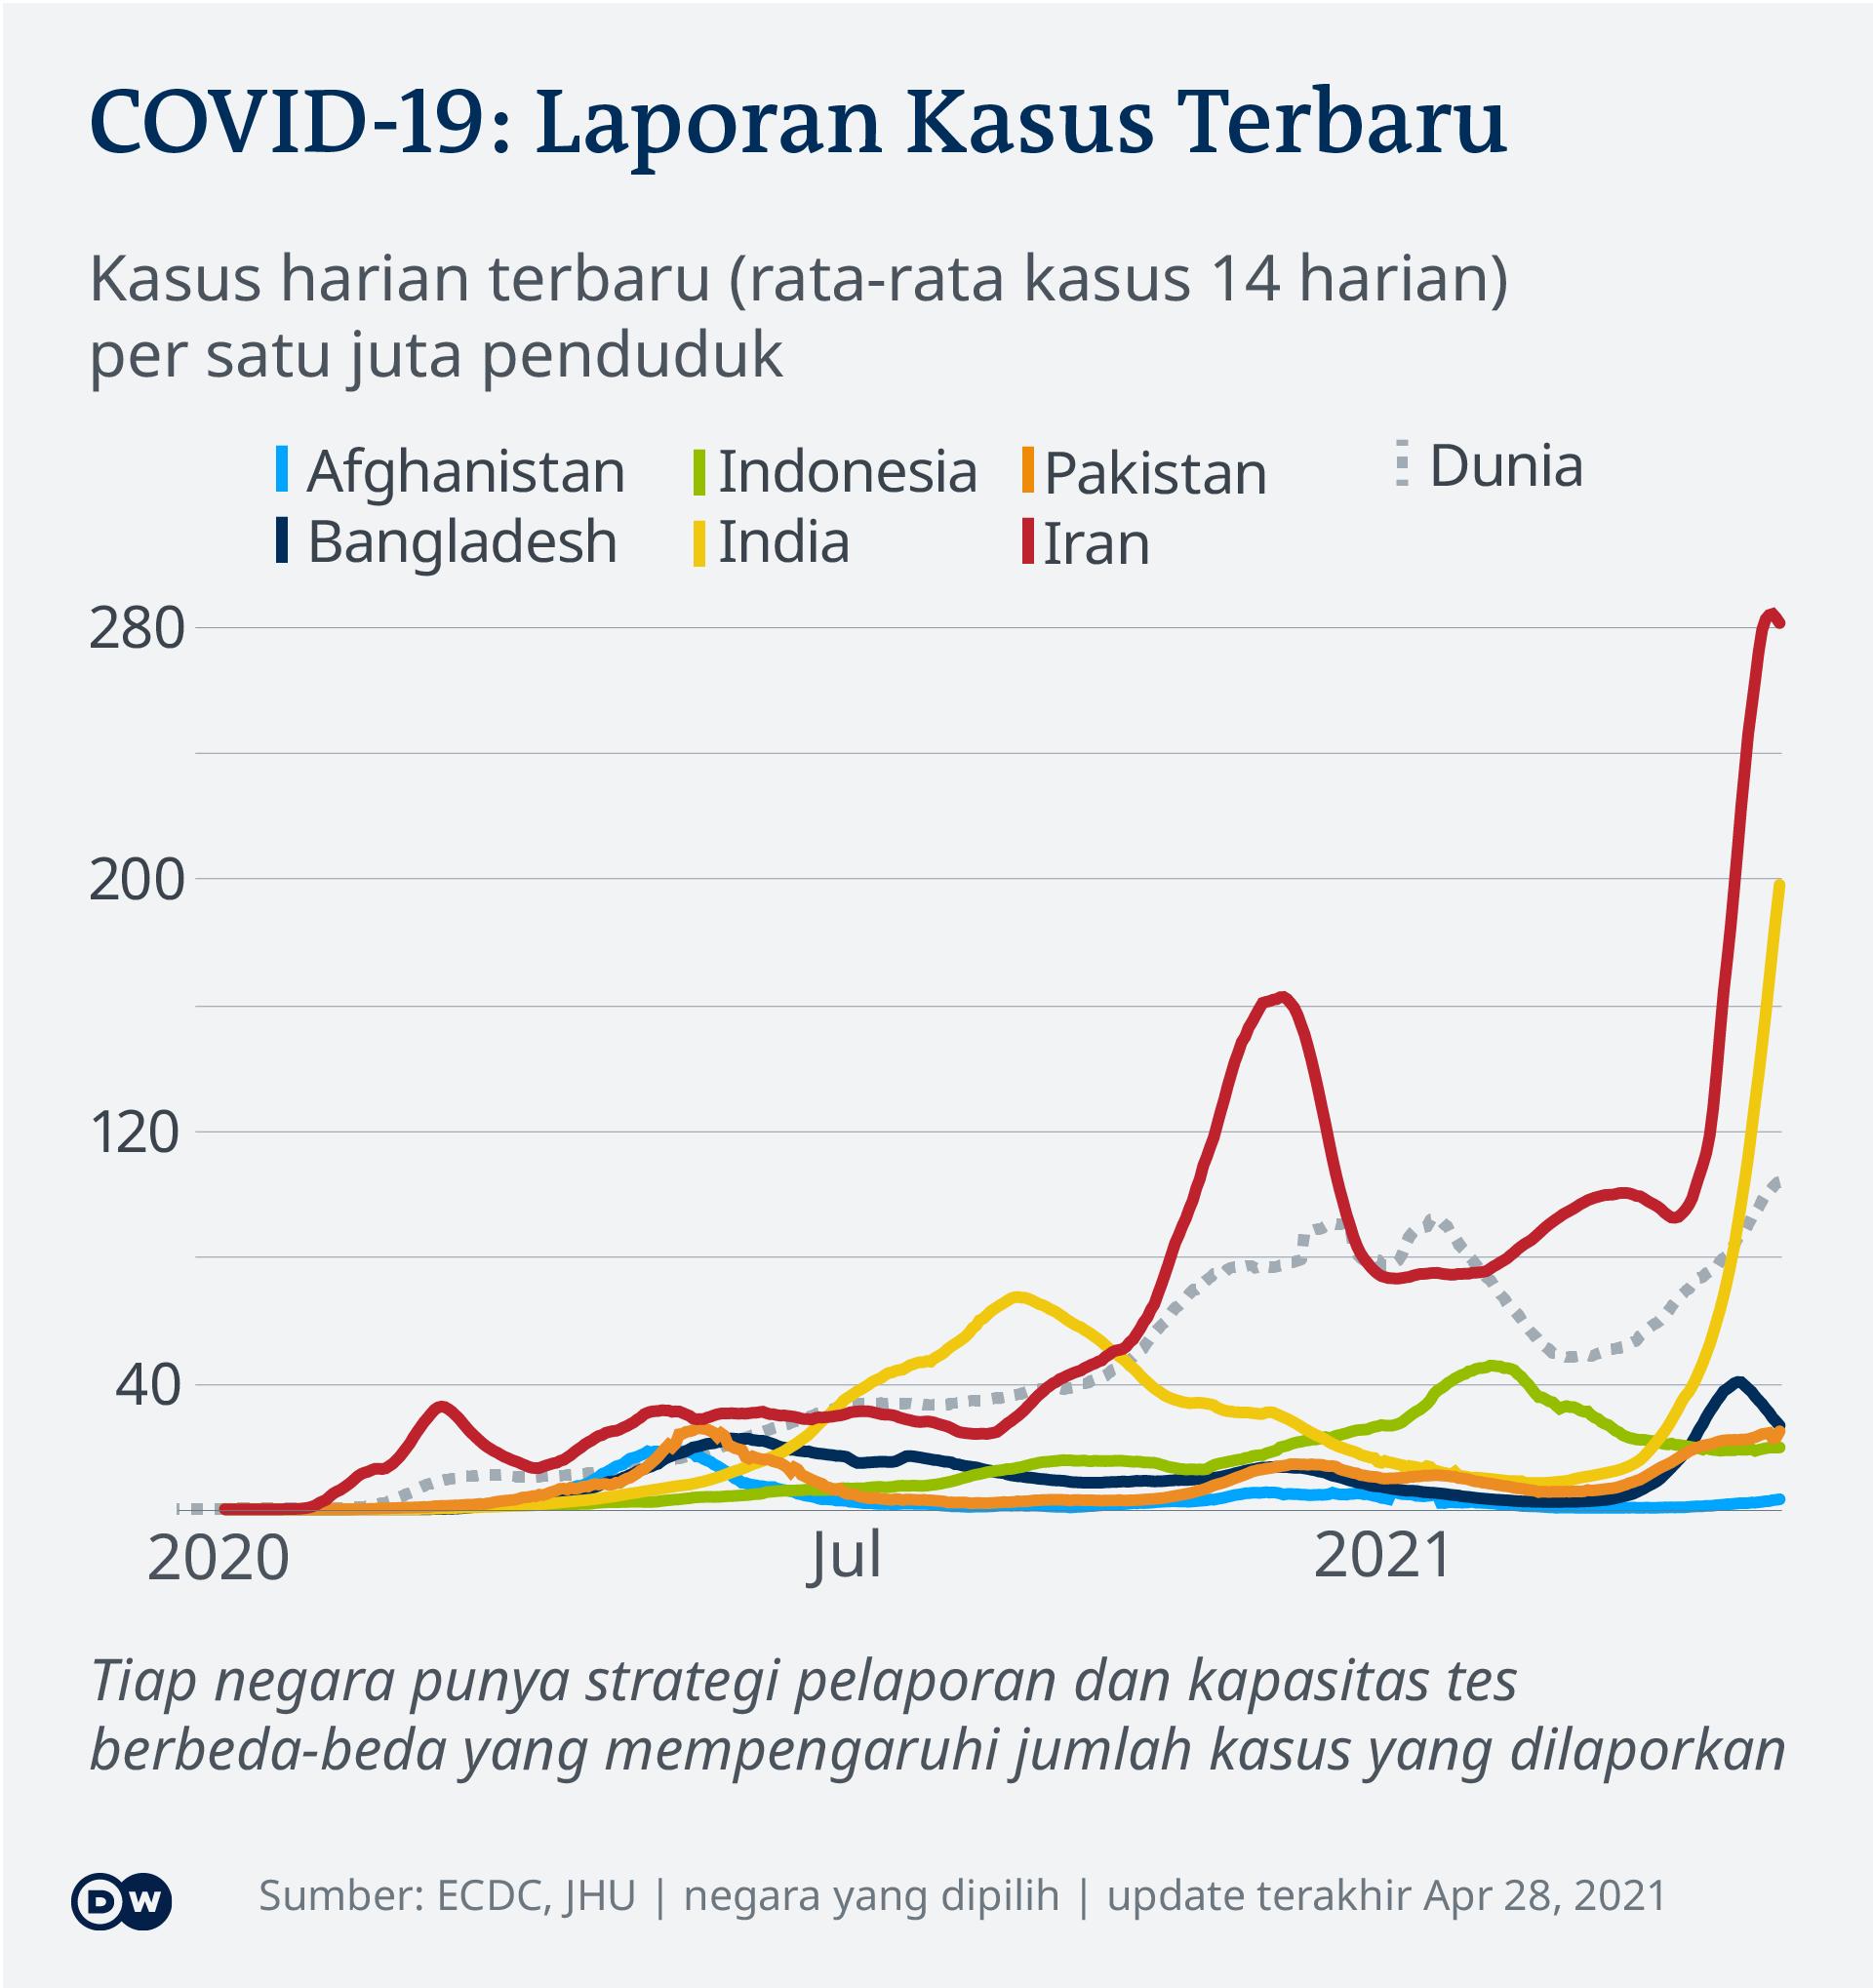 Data kasus harian COVID-19 per satu juta penduduk di beberapa negara di dunia